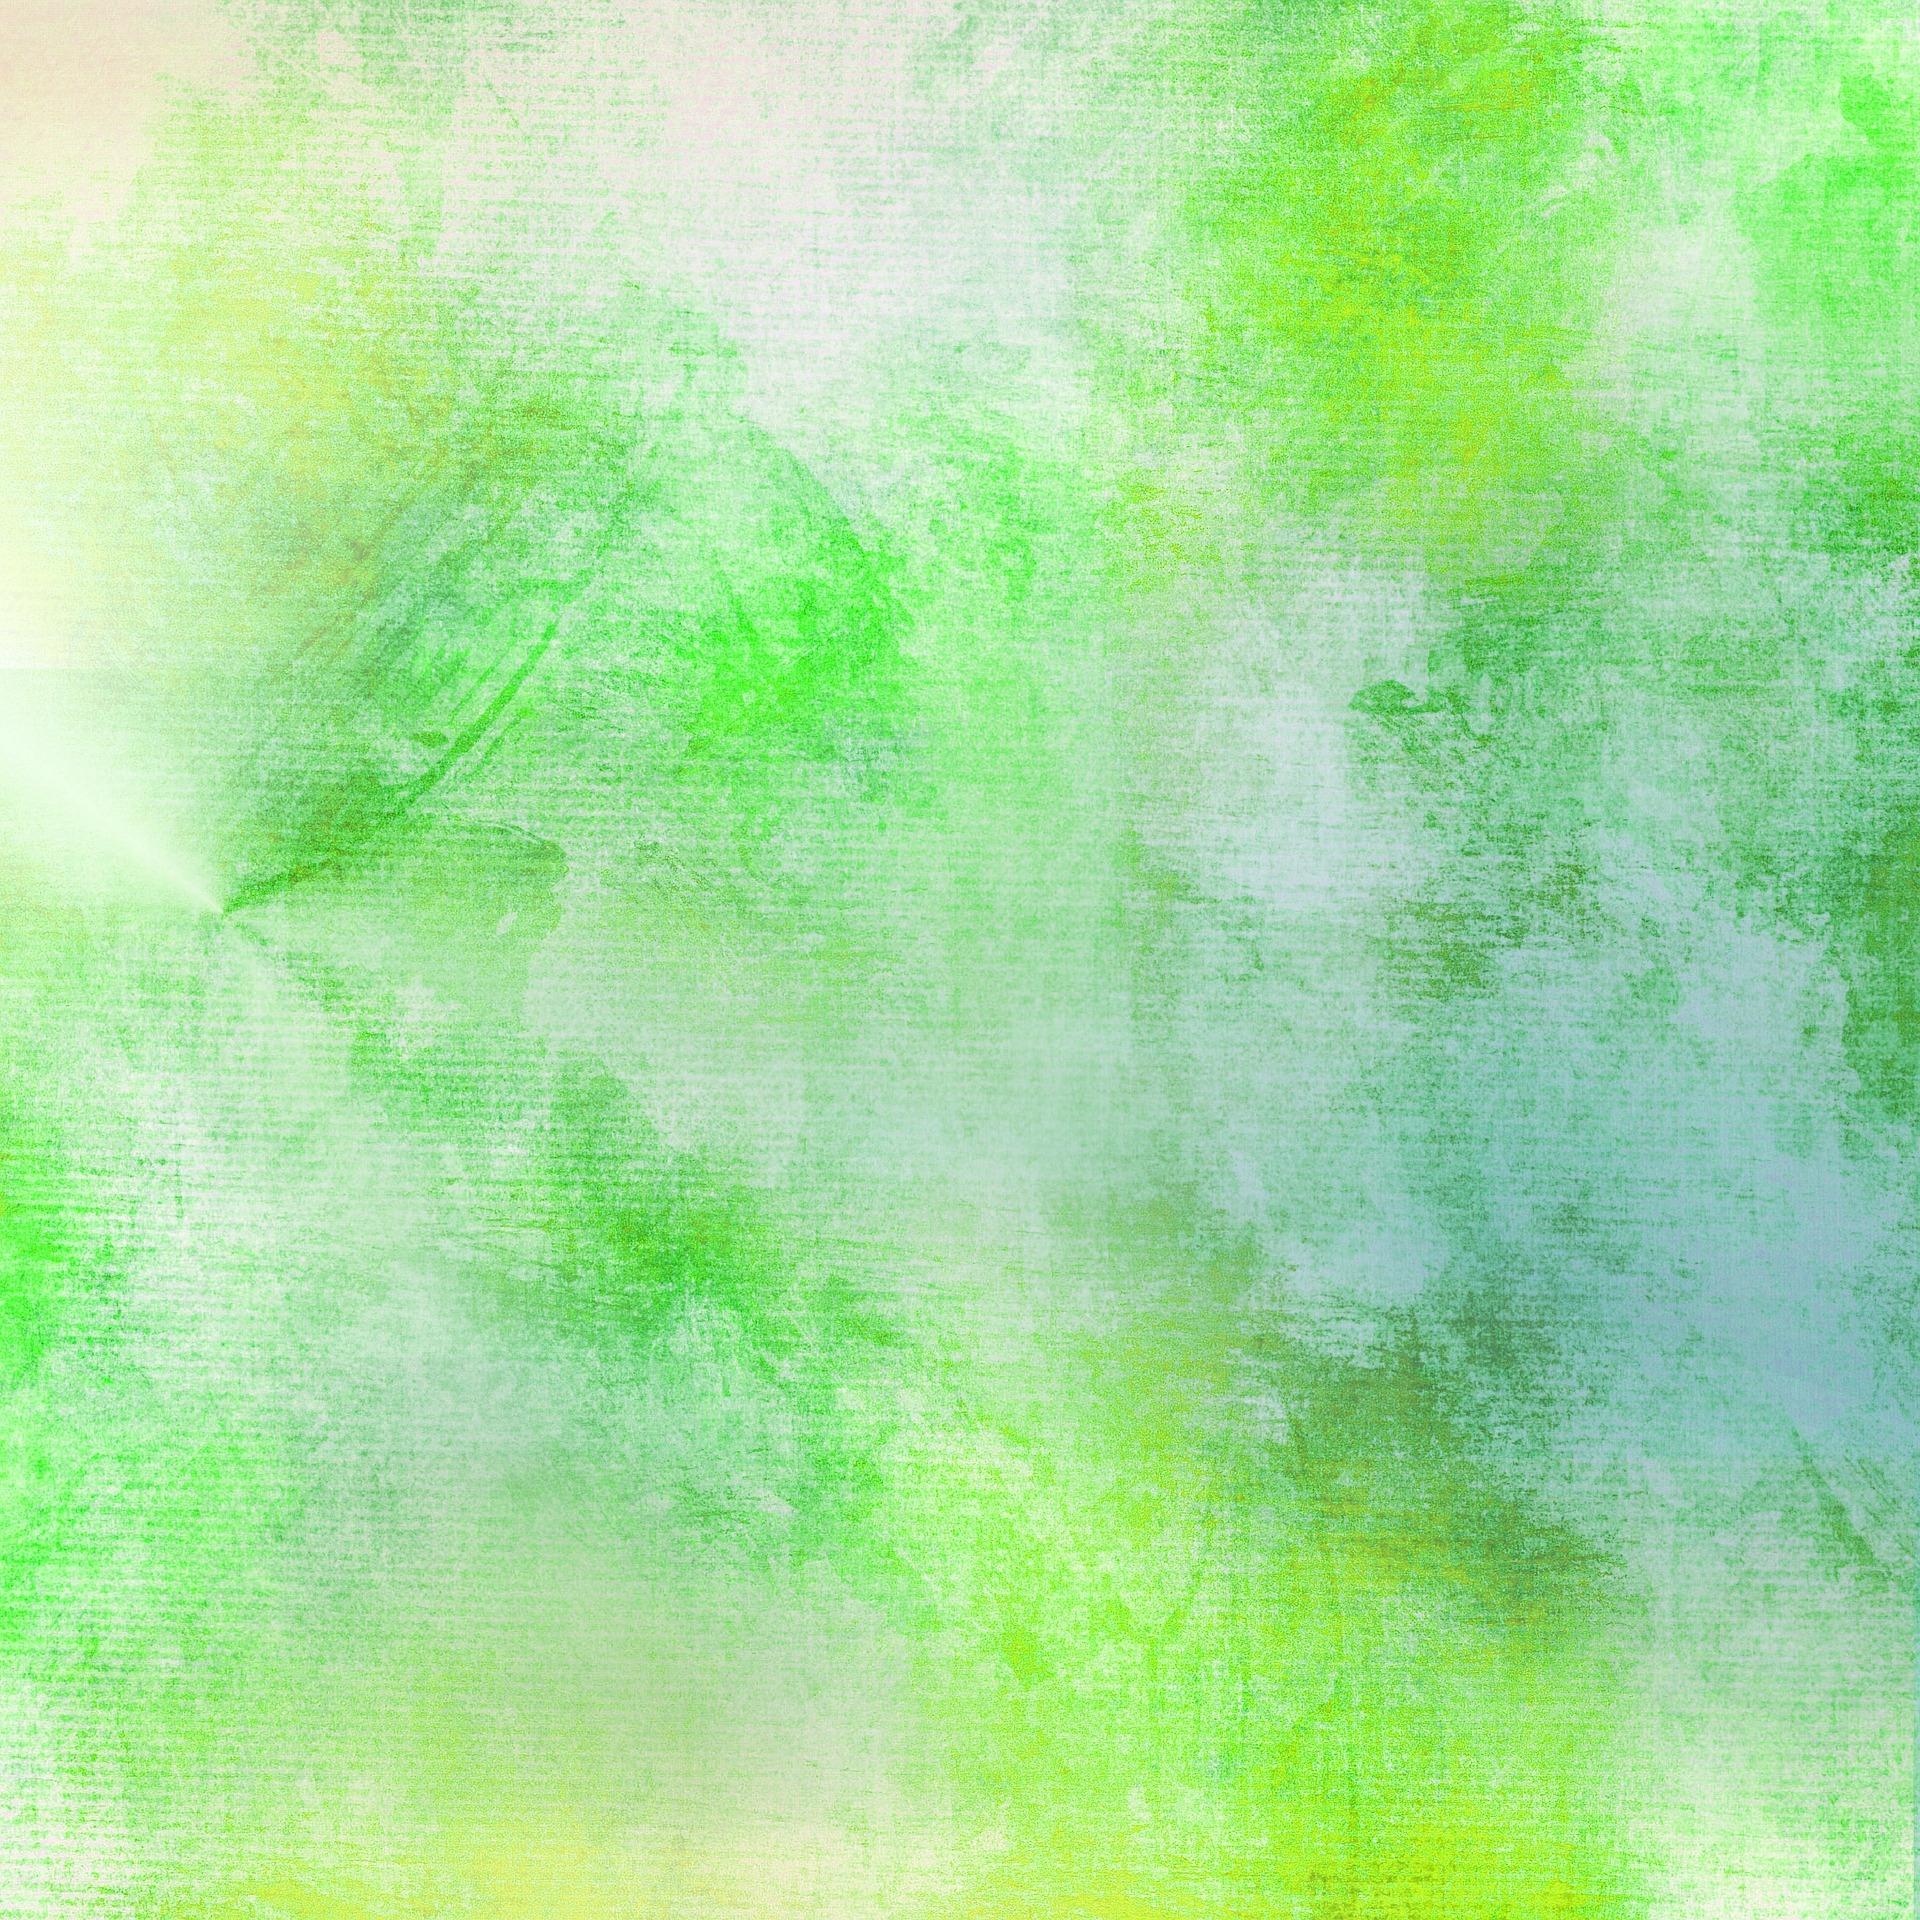 Green Texture, Graphics, Green, Texture, HQ Photo